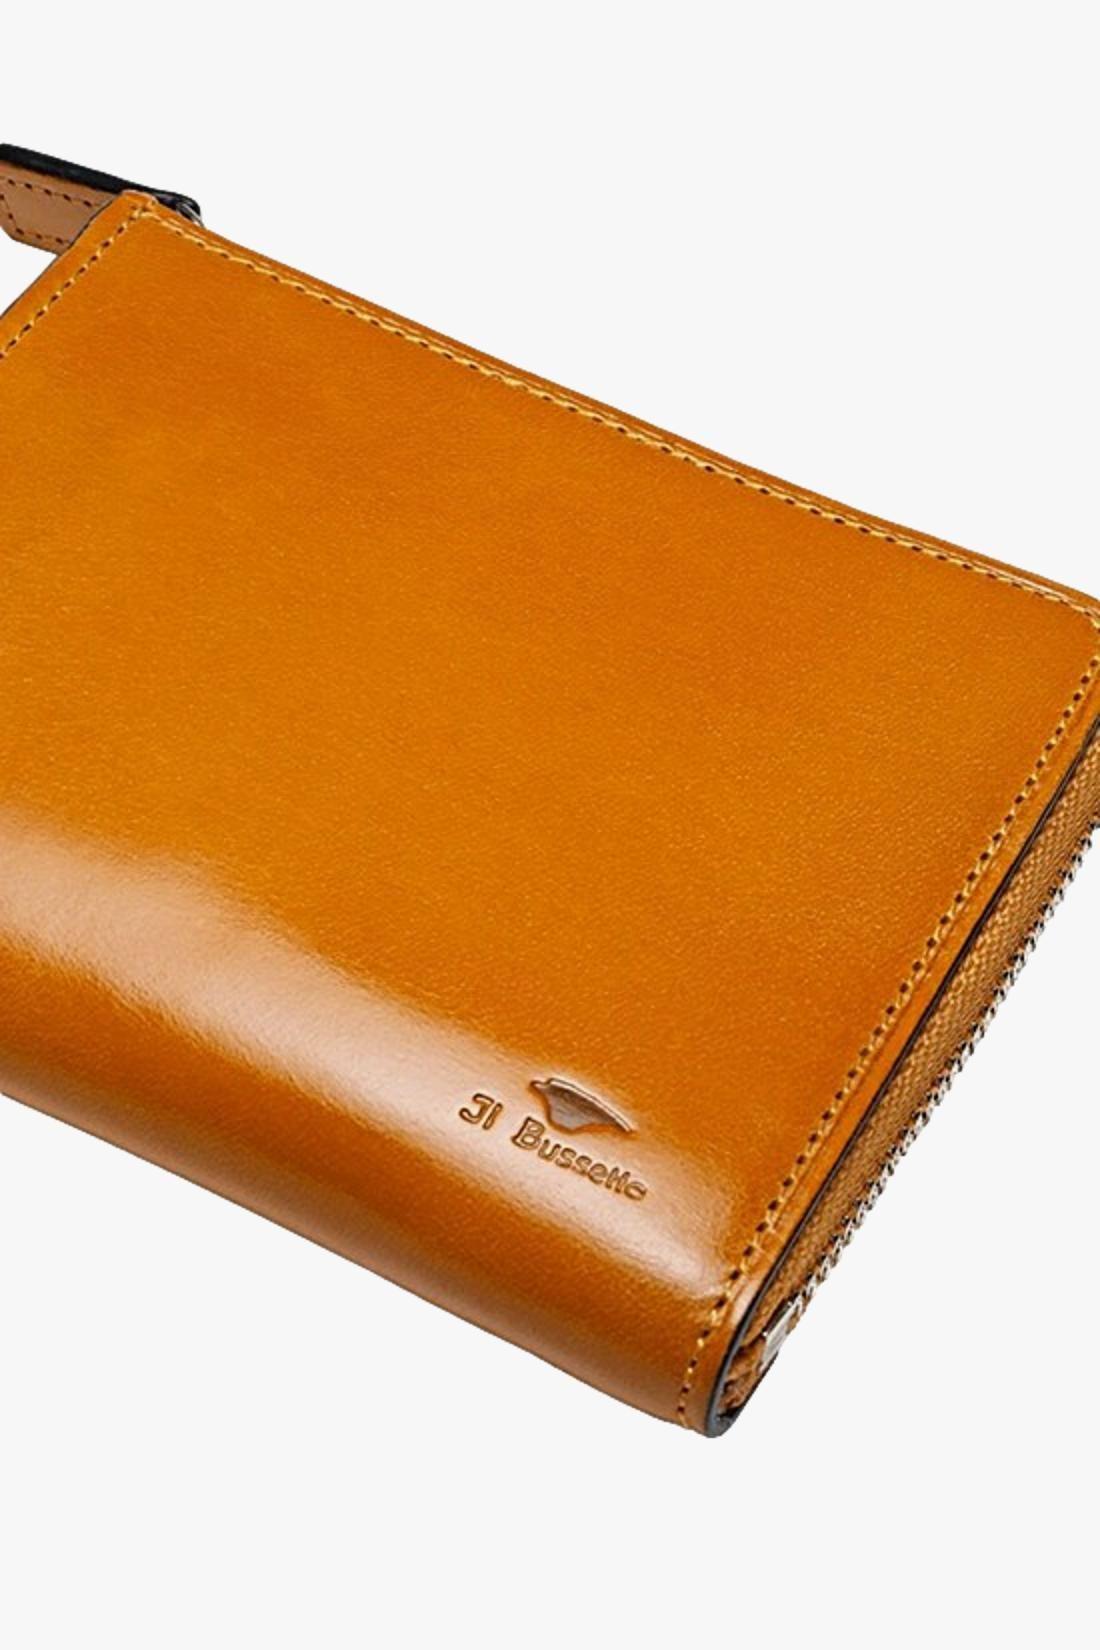 IL BUSSETTO / Isola wallet Ochre